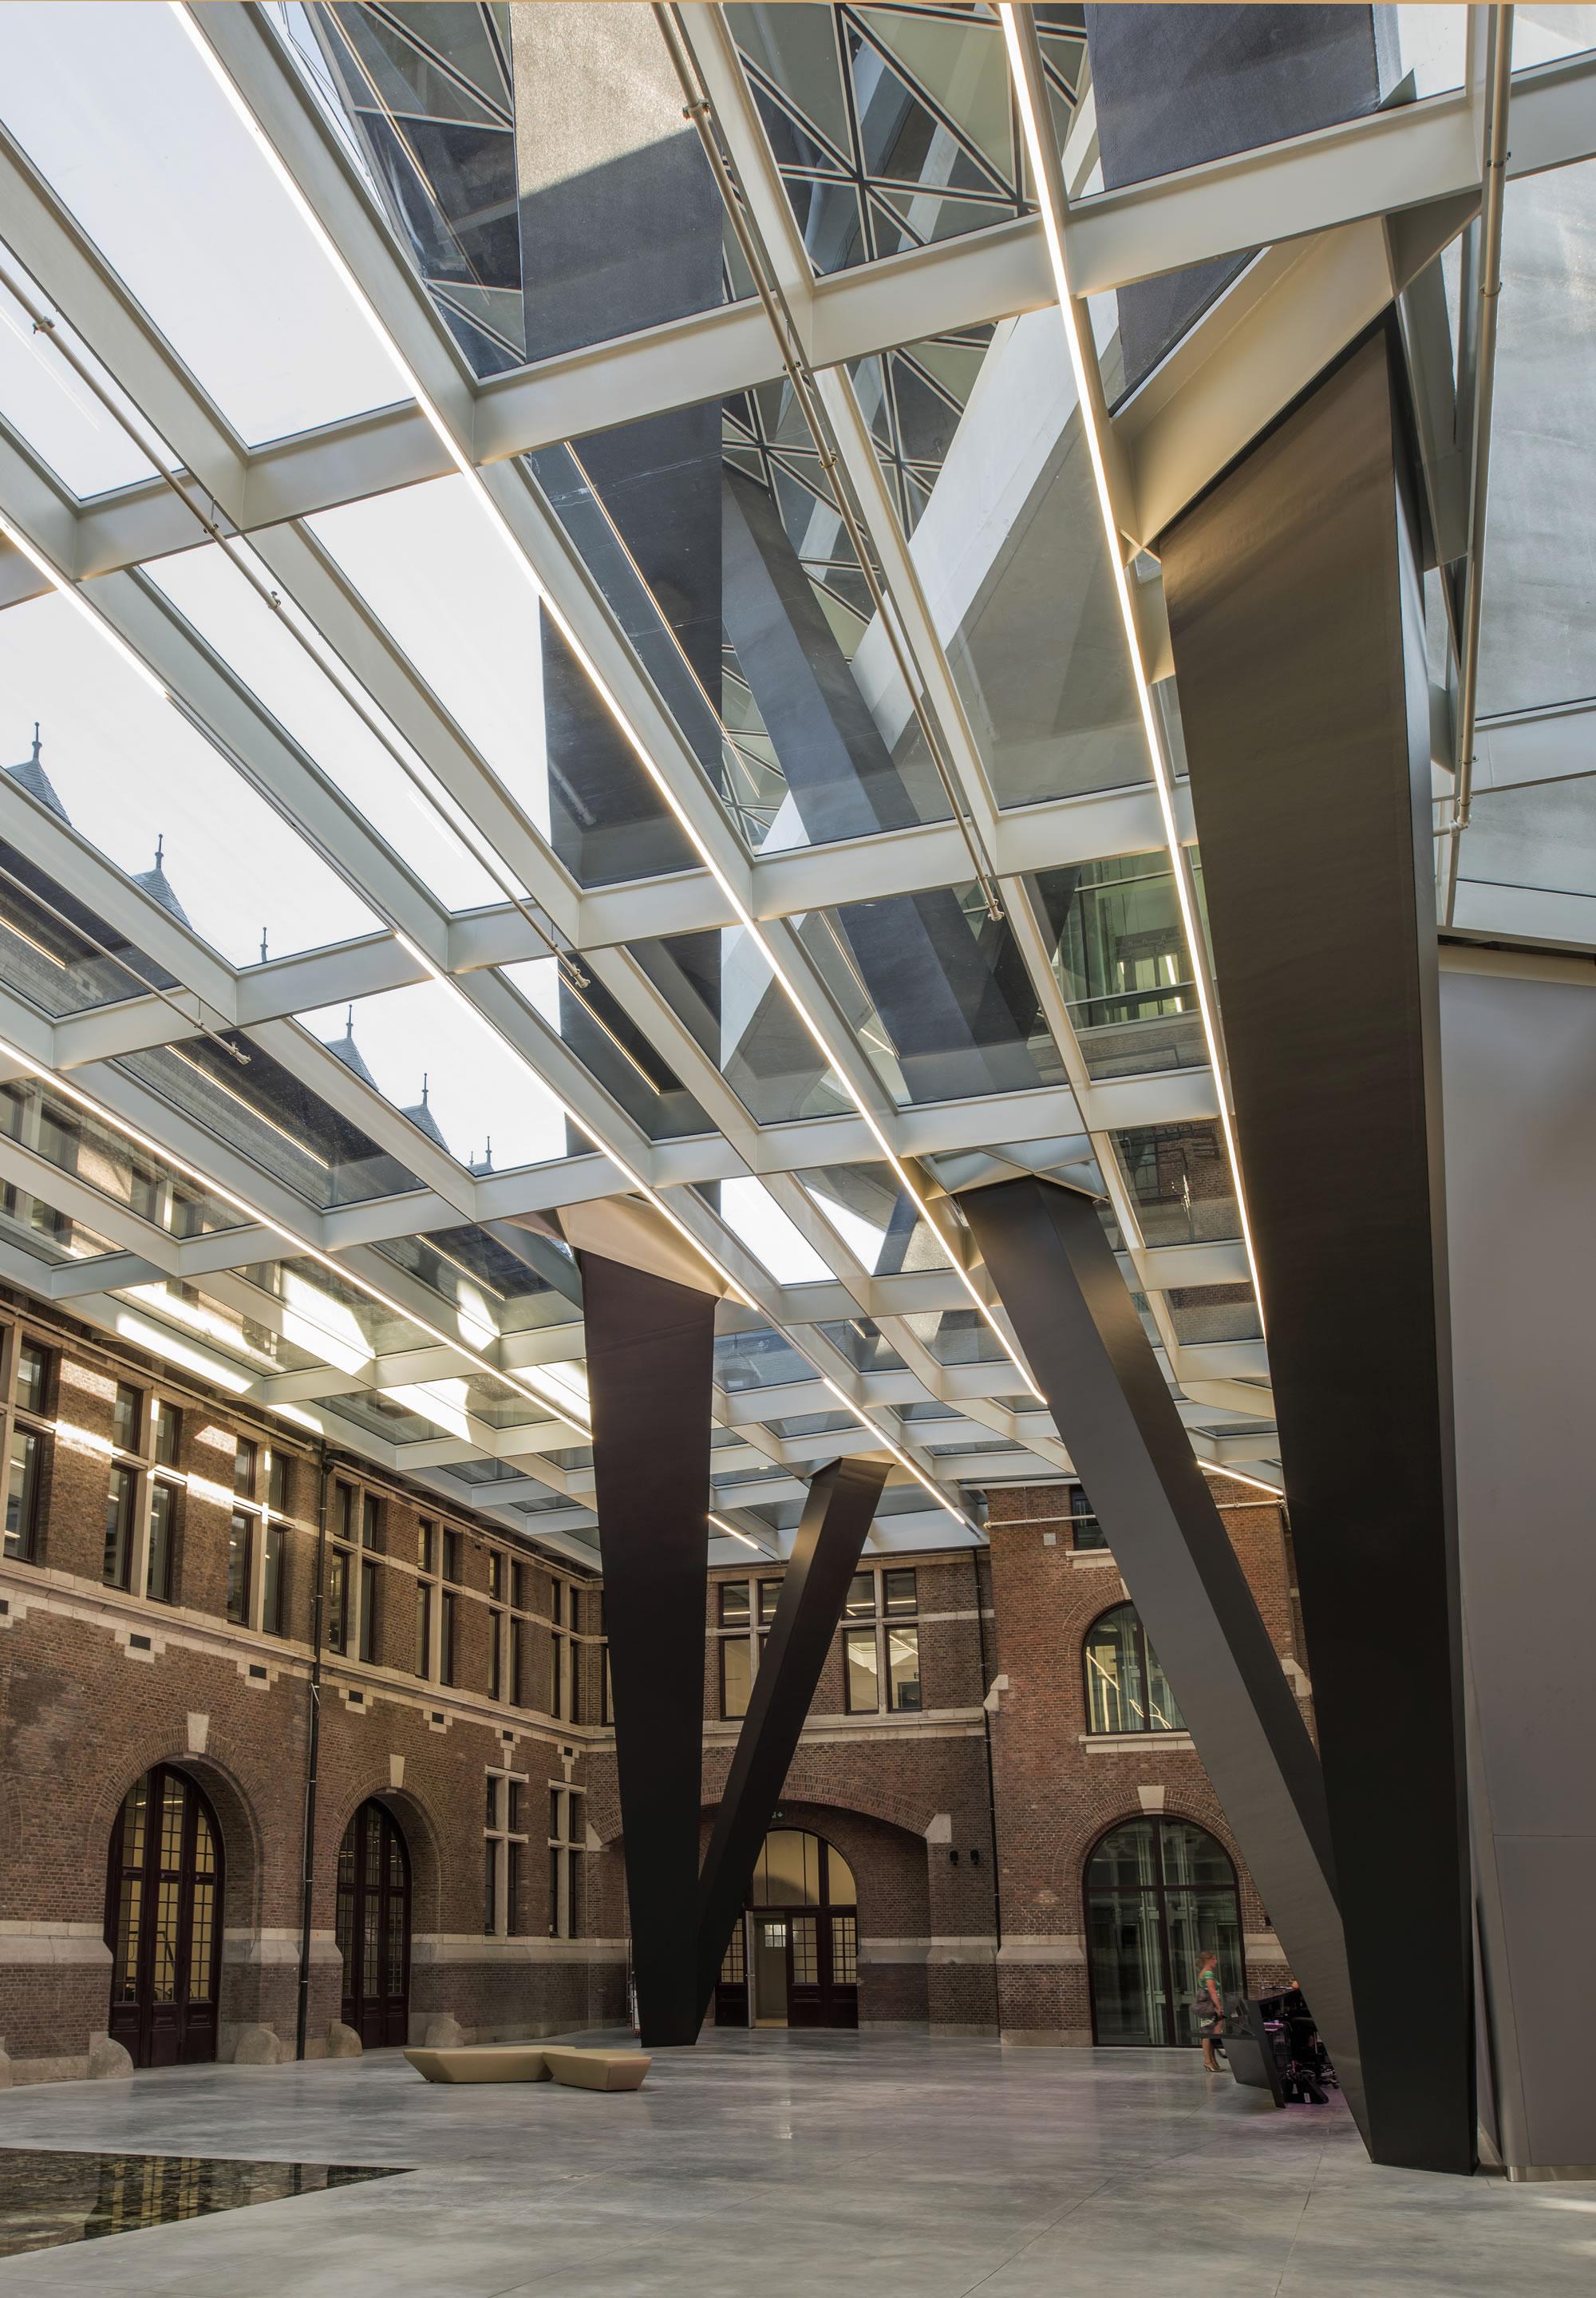 ZHA_Port House Antwerp_atrium ∏ Tim Fisher 2016.jpg